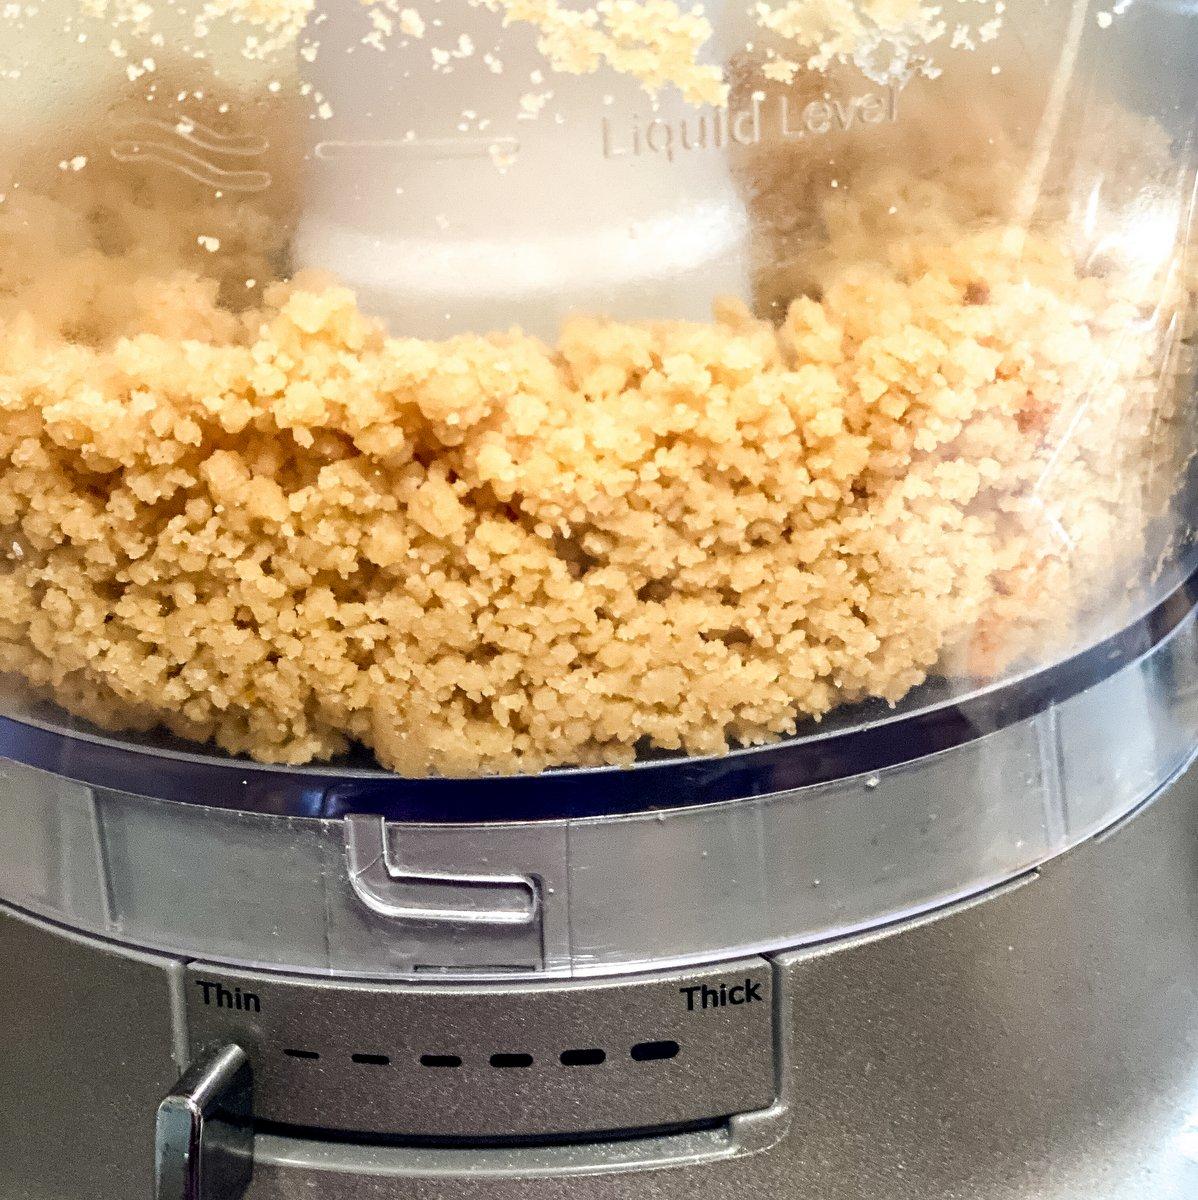 Cake crumbs in a food processor